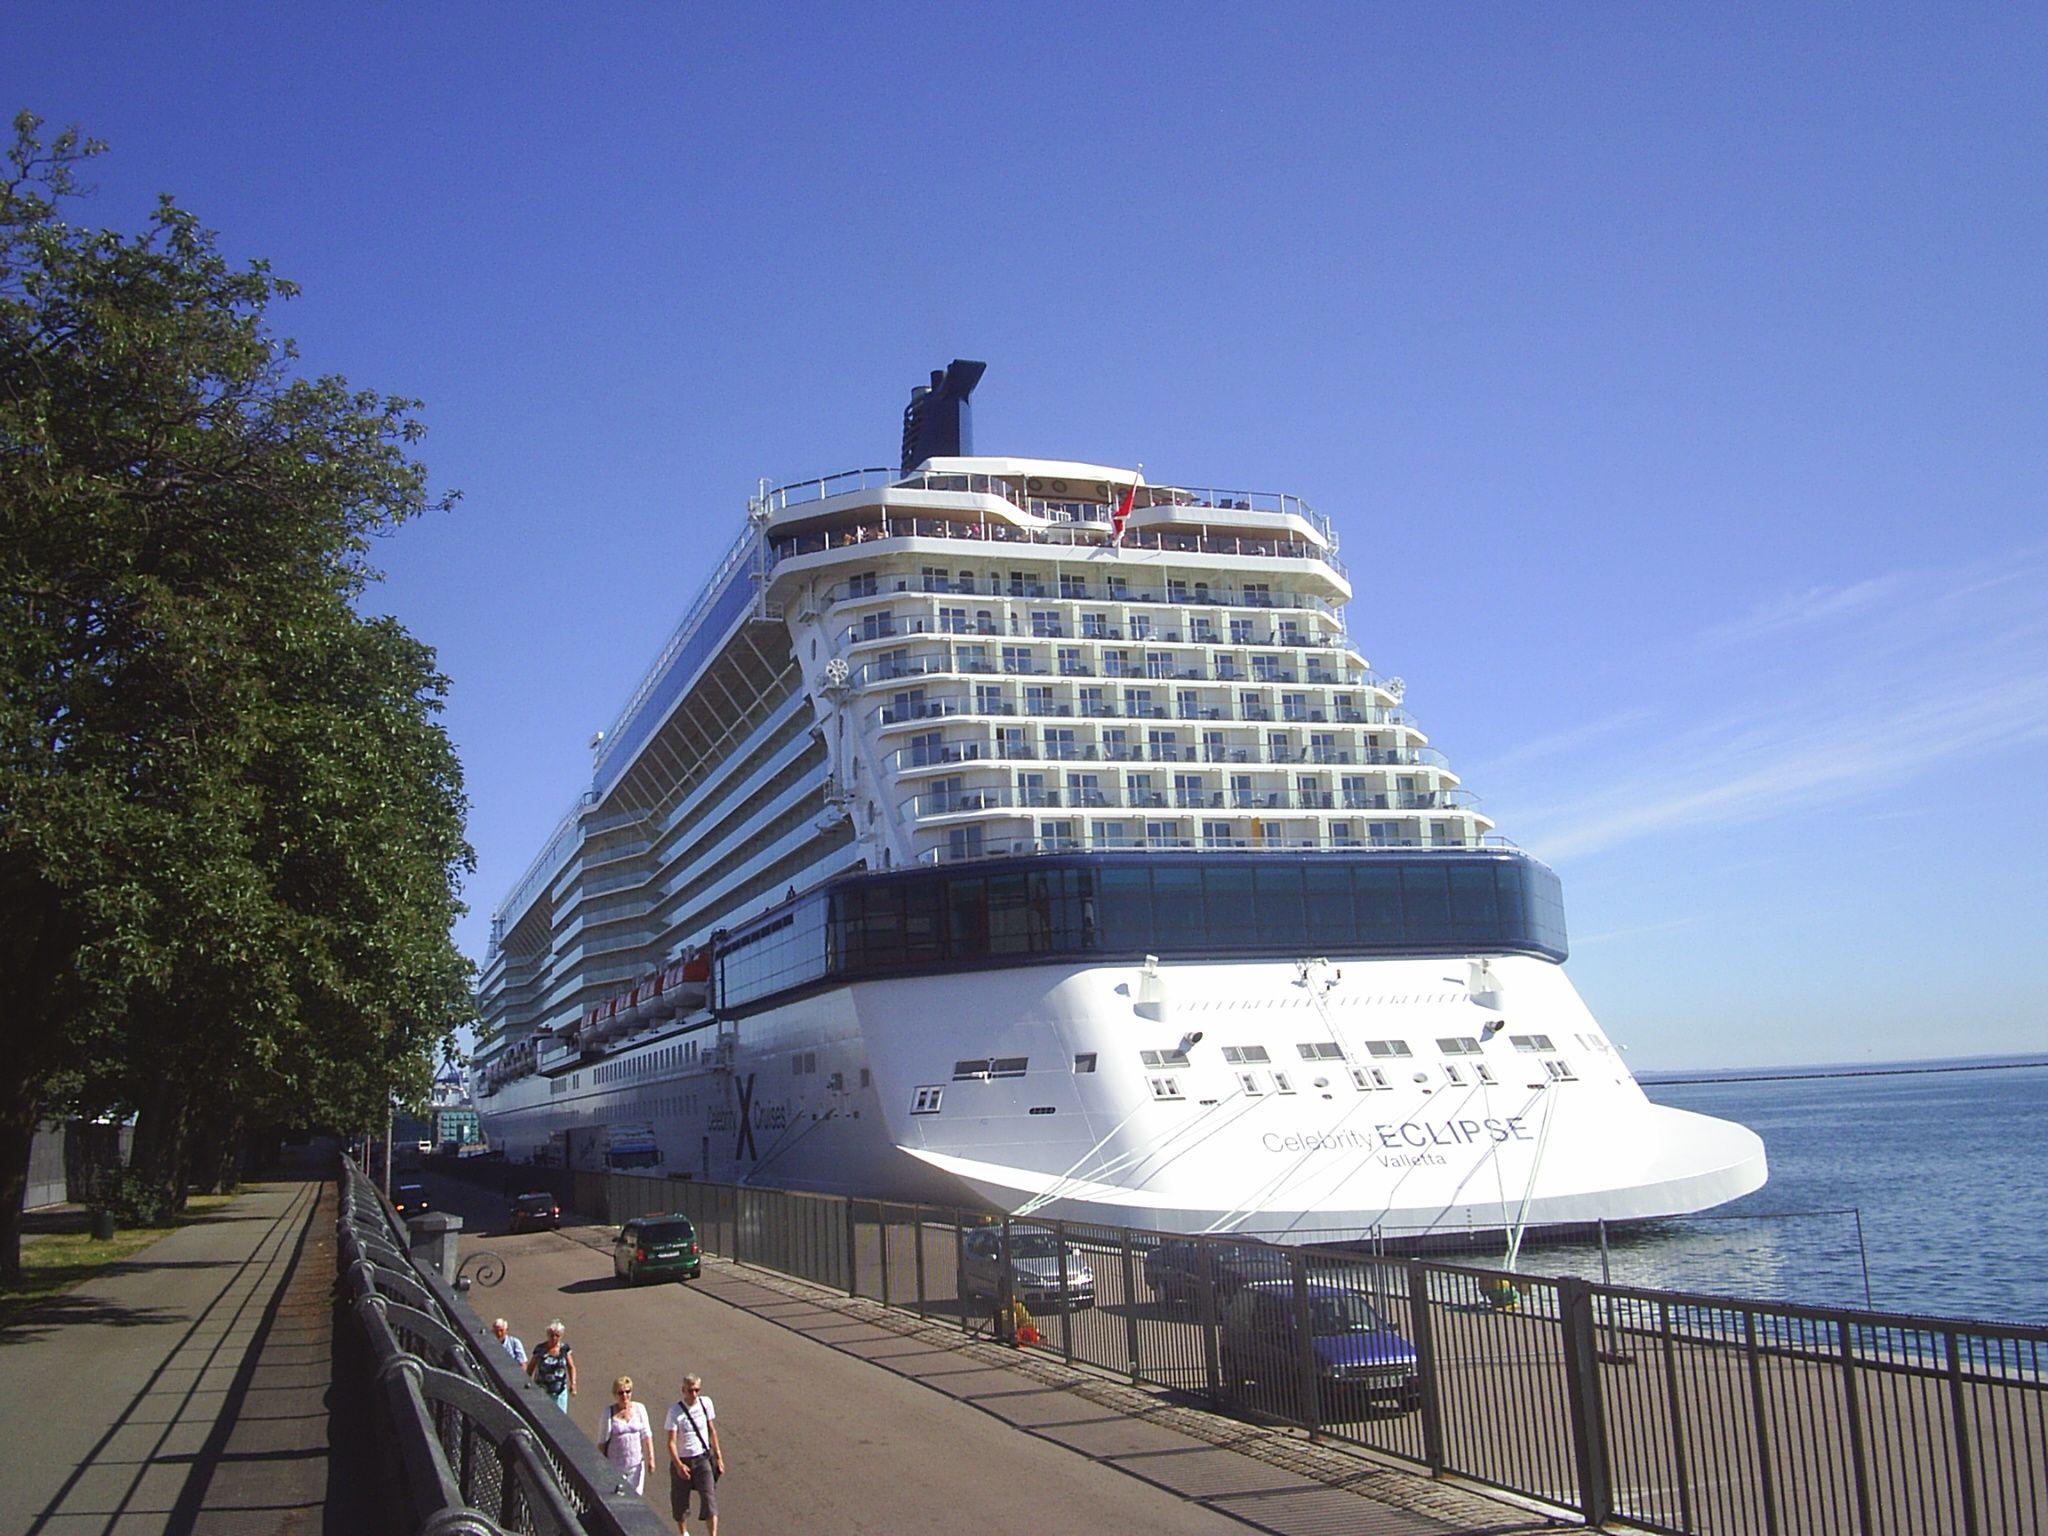 Pratasussurro Navios Barcos Iates Pinterest Cruise - Cruise ship copenhagen